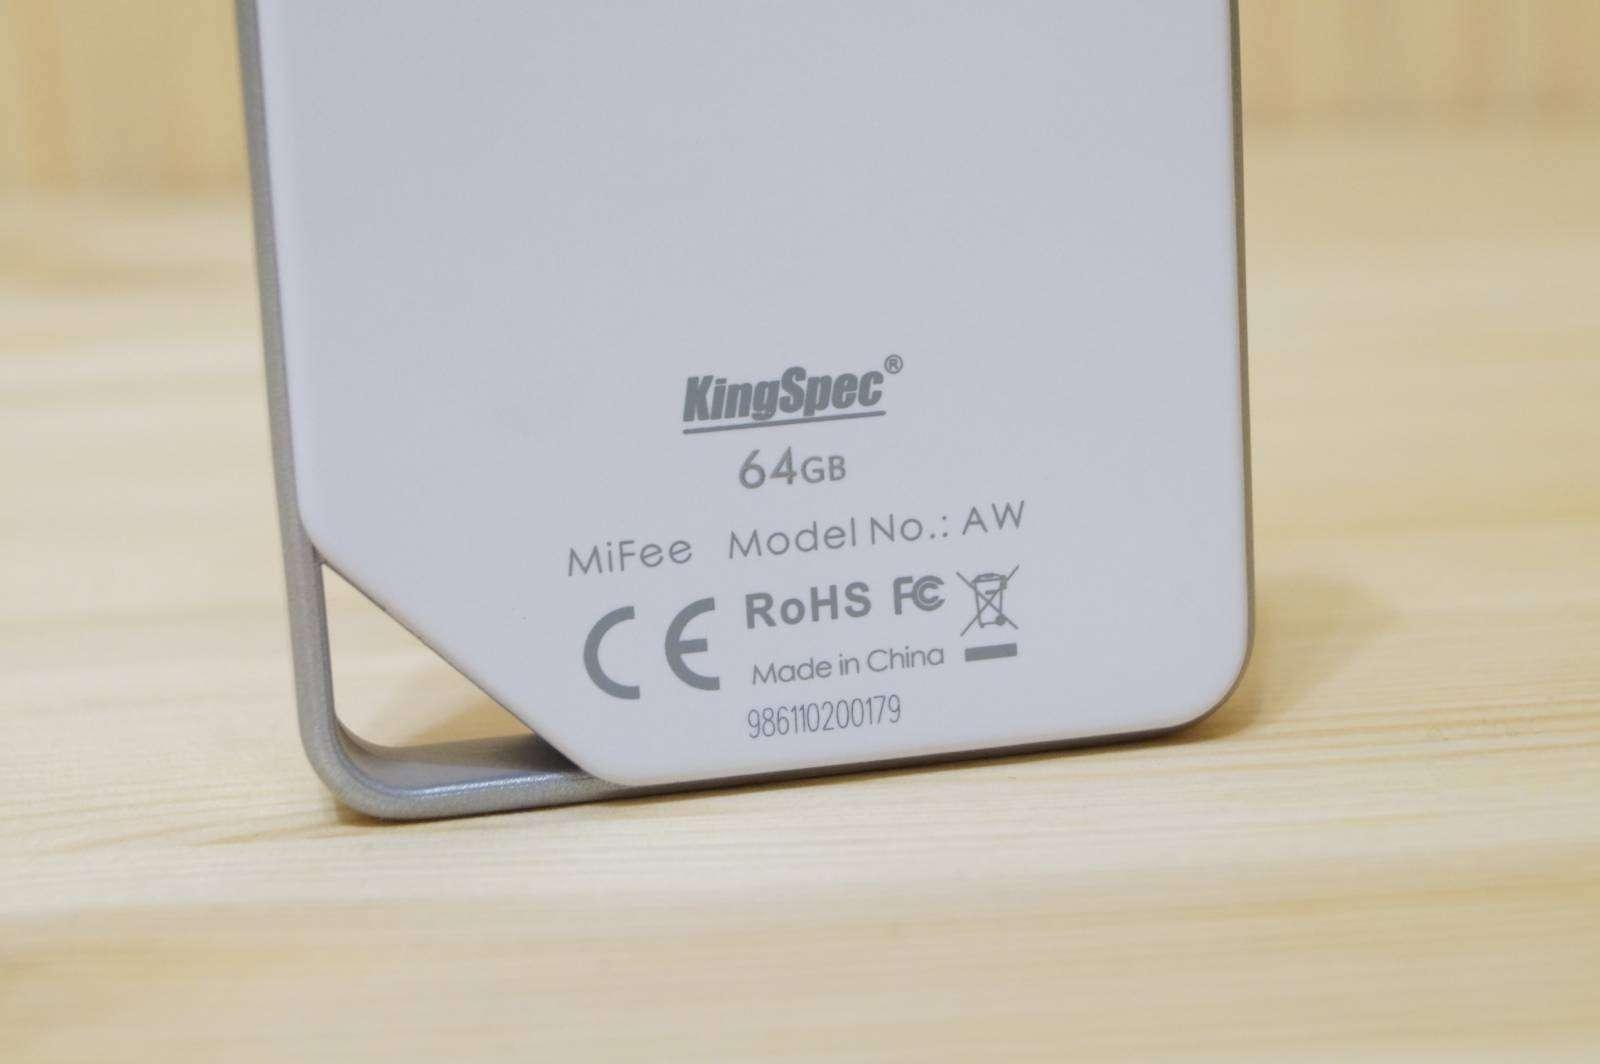 Aliexpress: Беспроводной накопитель KingSpec MiFee AW на 64гб, облако в штанах.